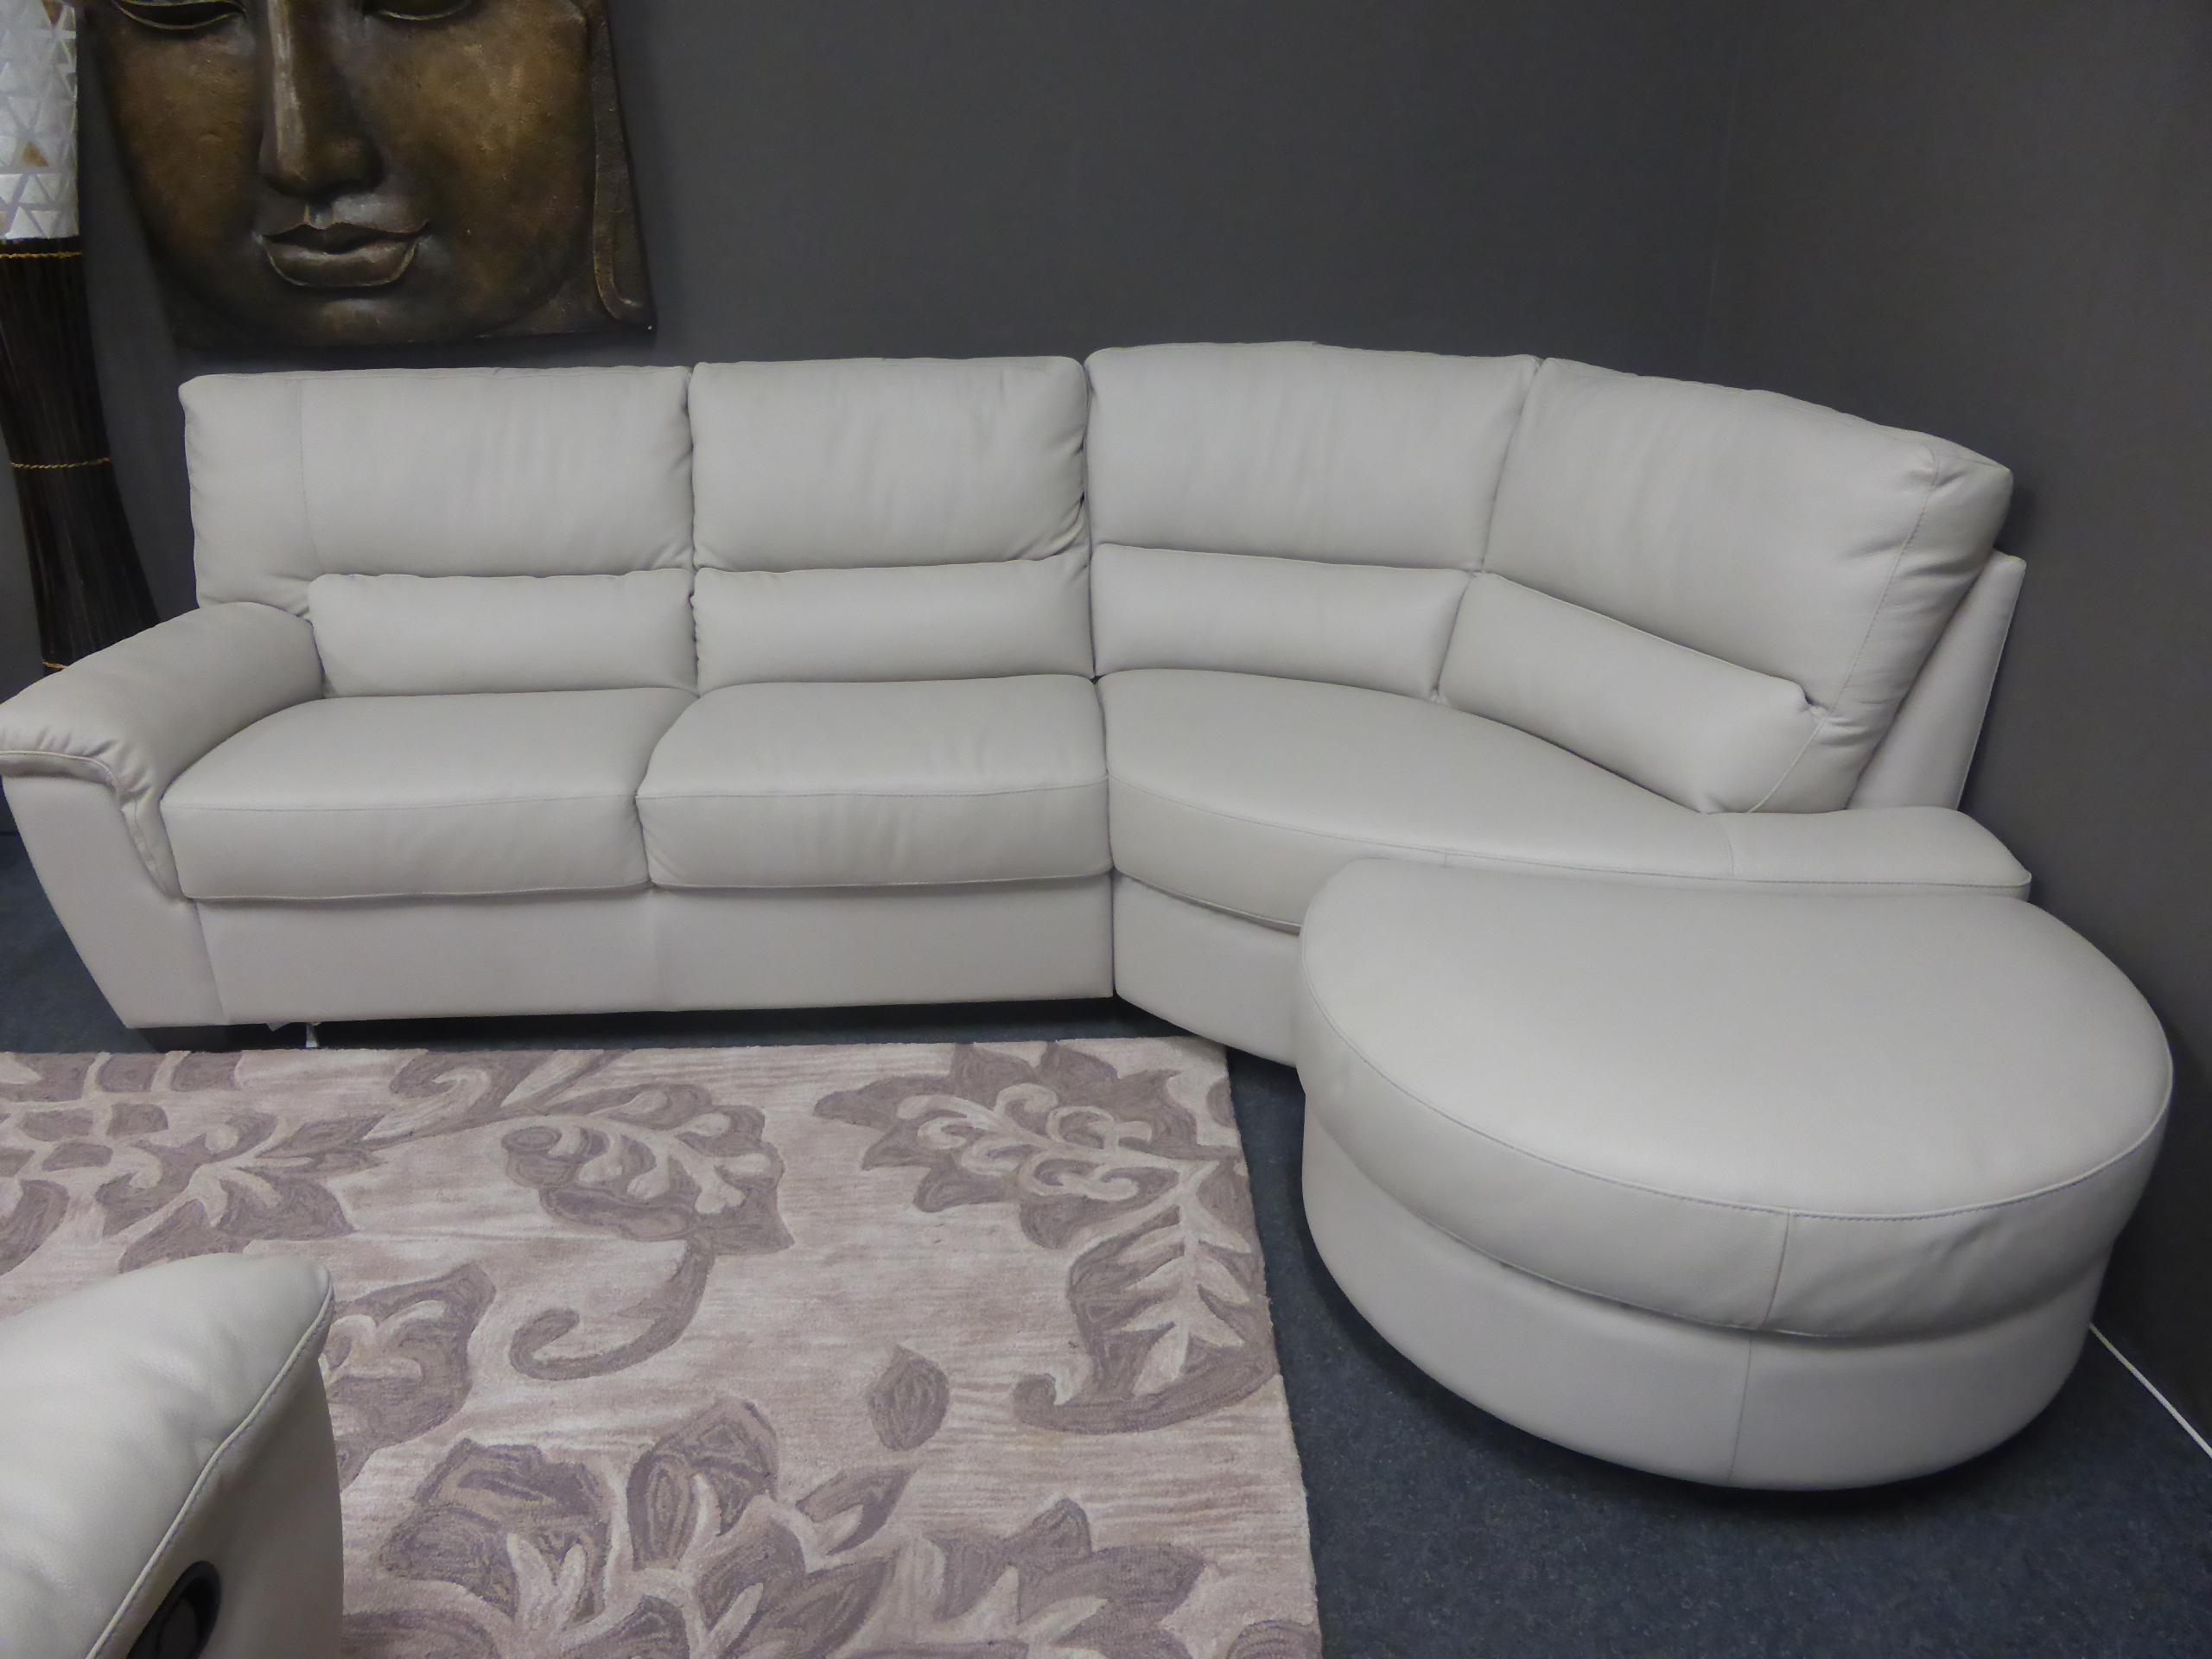 high end leather sofas uk storage sofa table natuzzi editions peruvia italian curve